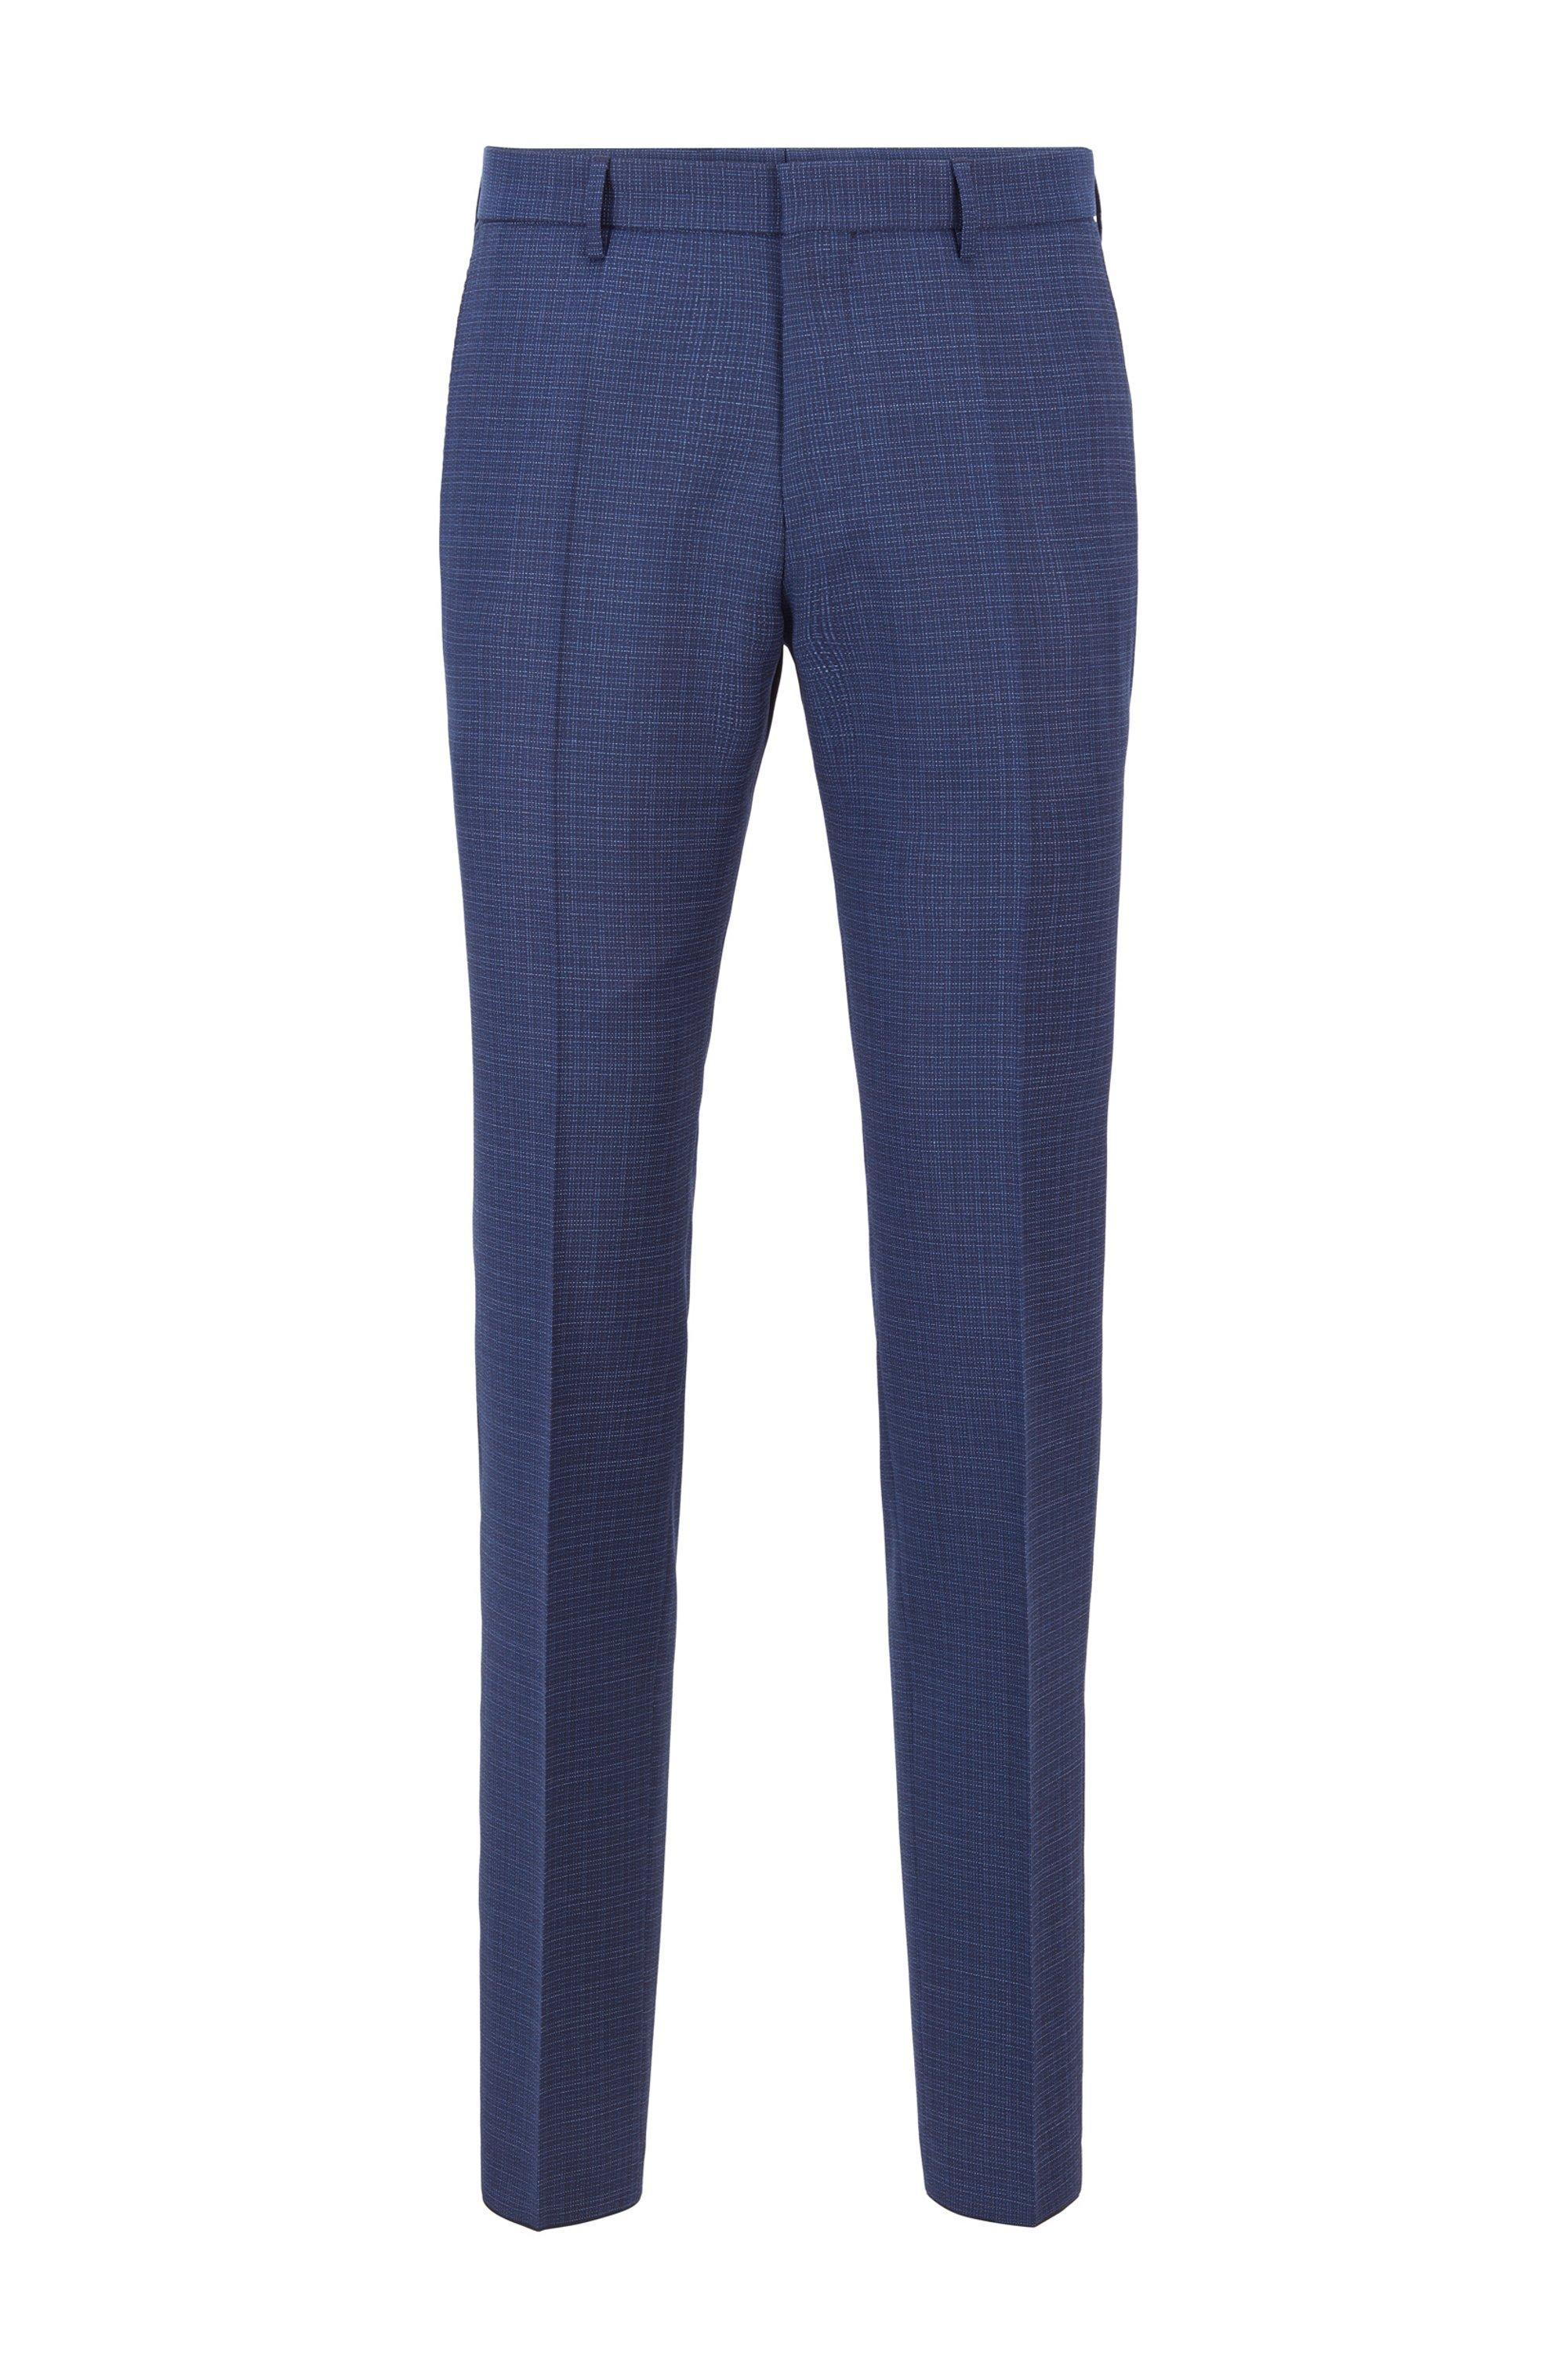 Slim-fit trousers in micro-patterned virgin wool, Blue Patterned